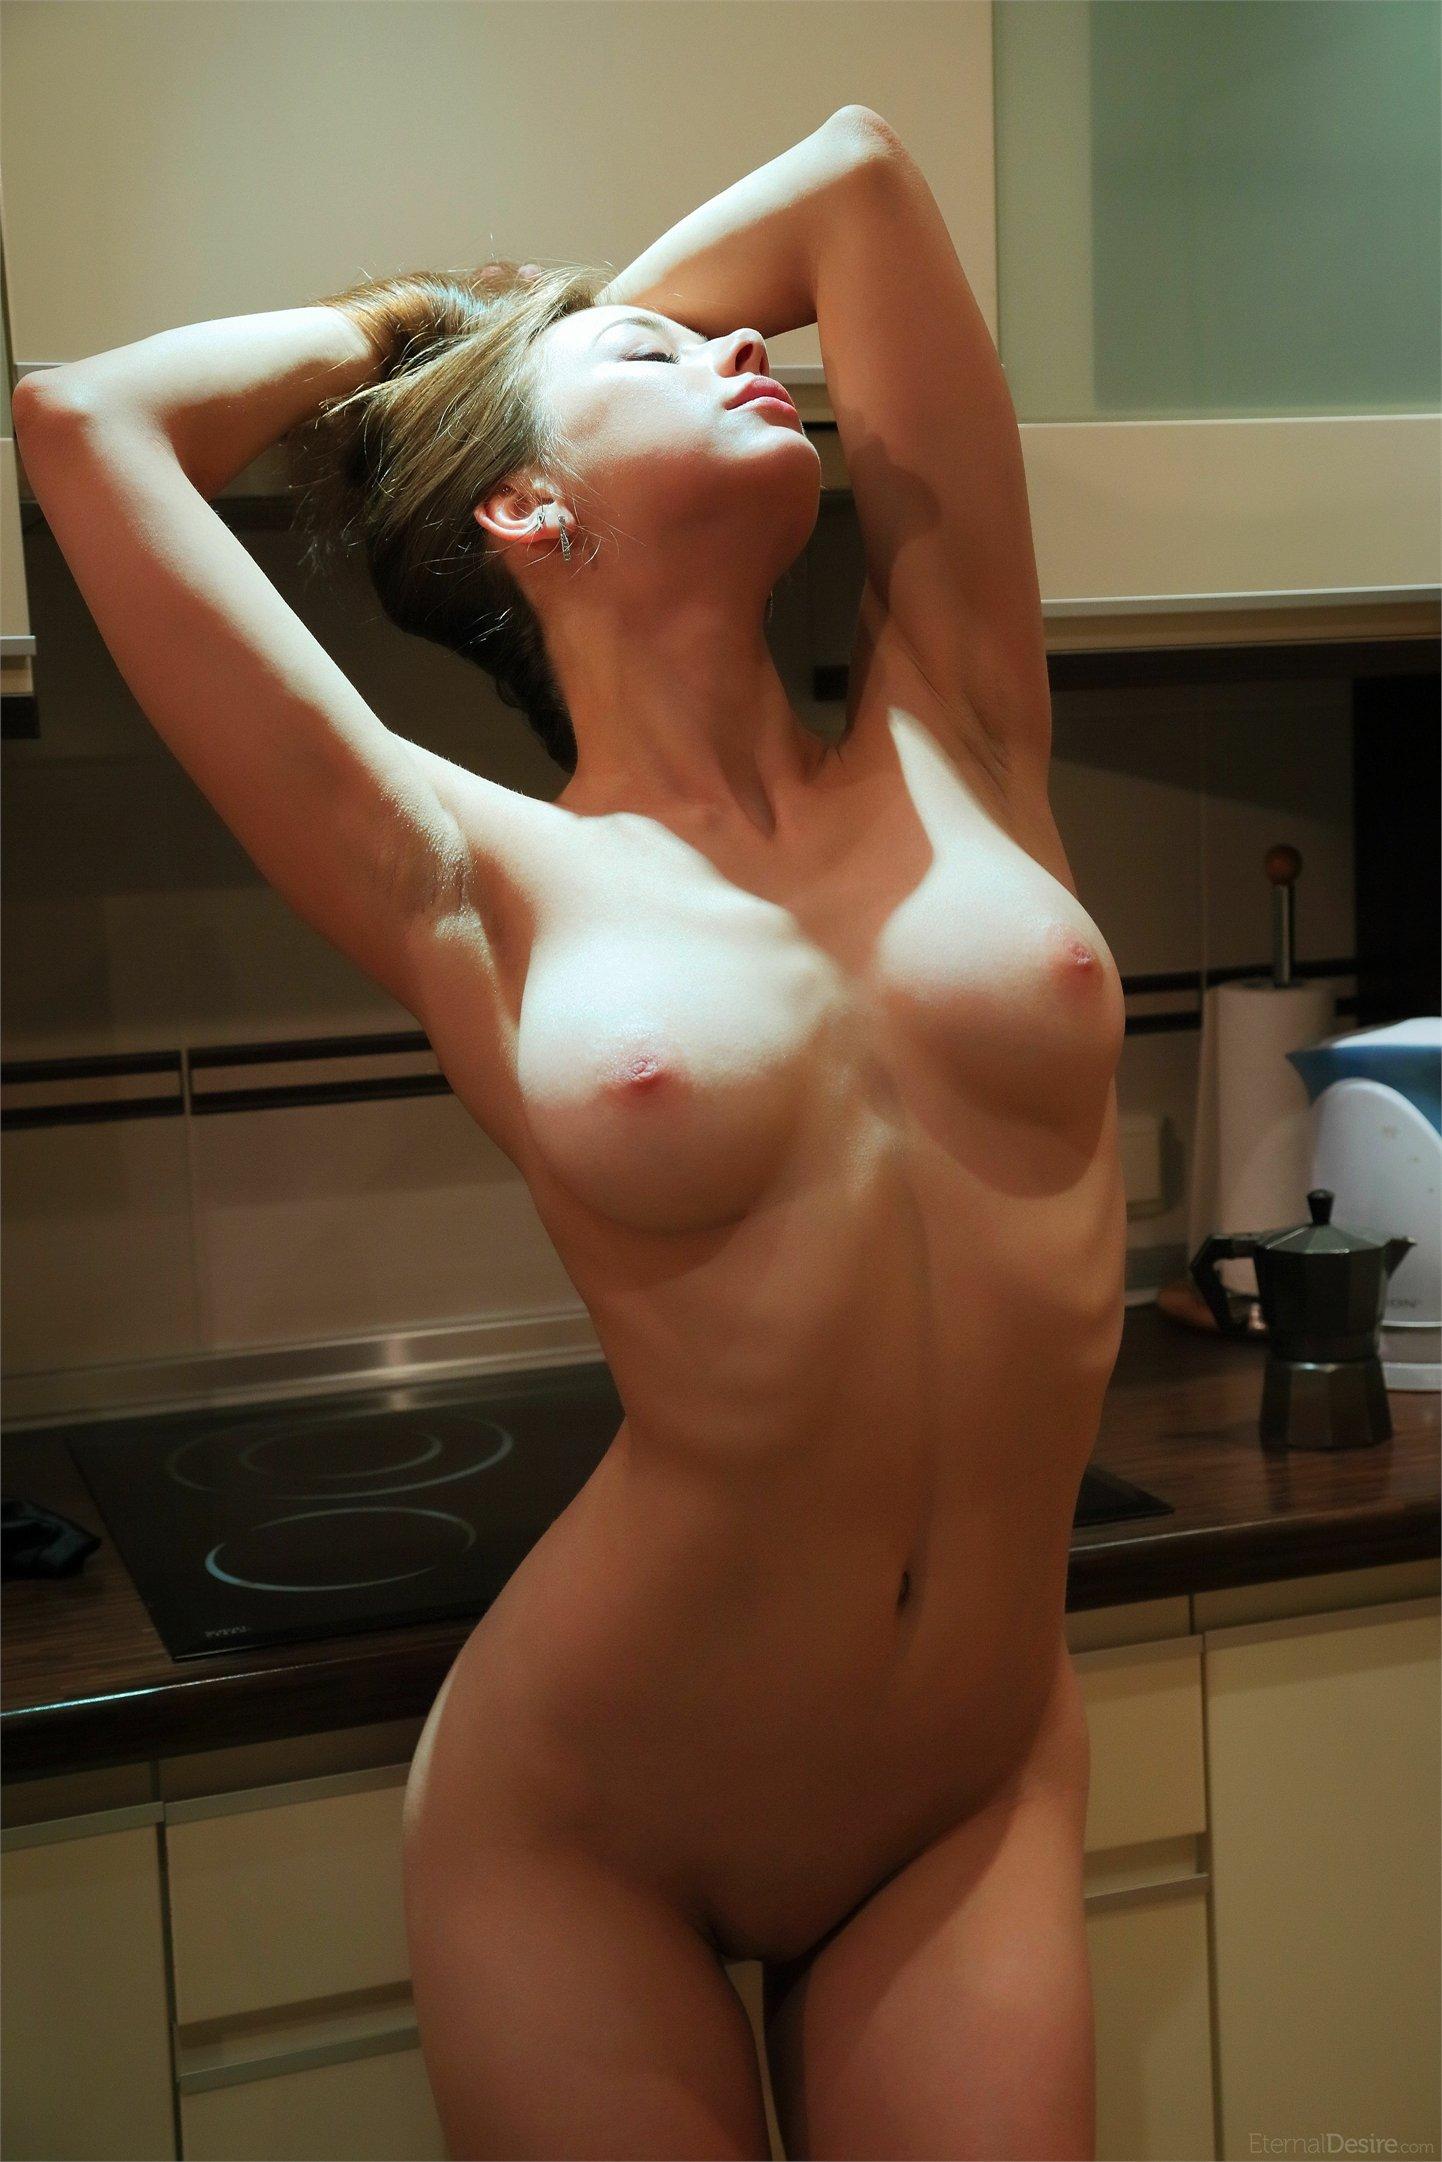 Eternal desire cute girl Miren nude photo gallery pic 7